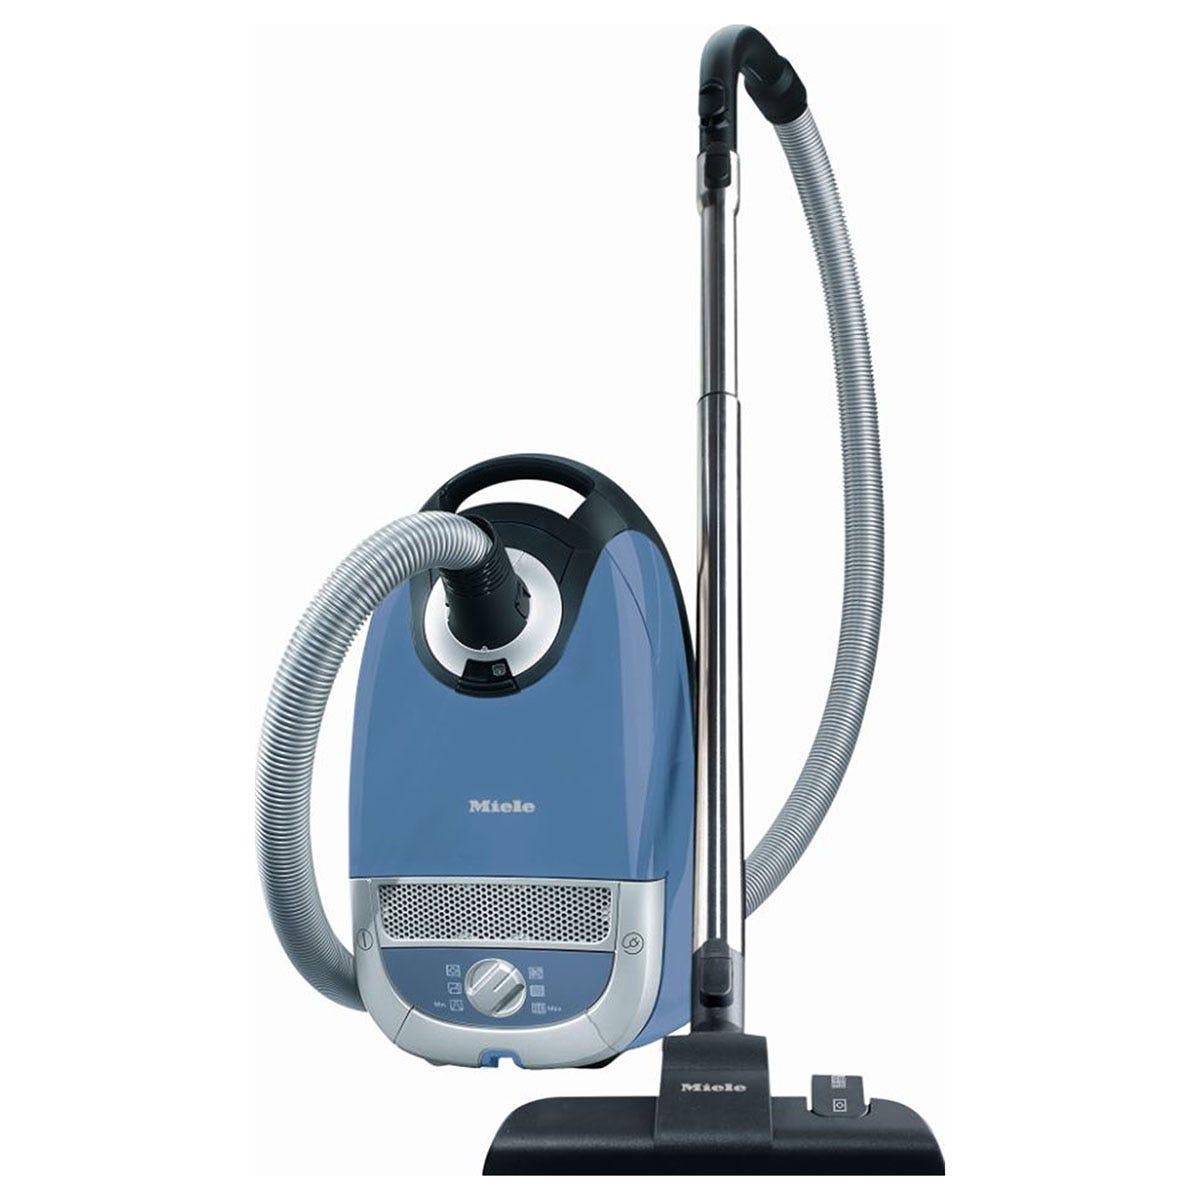 Miele C2 Complete Allergy Powerline Vacuum Cleaner - Blue